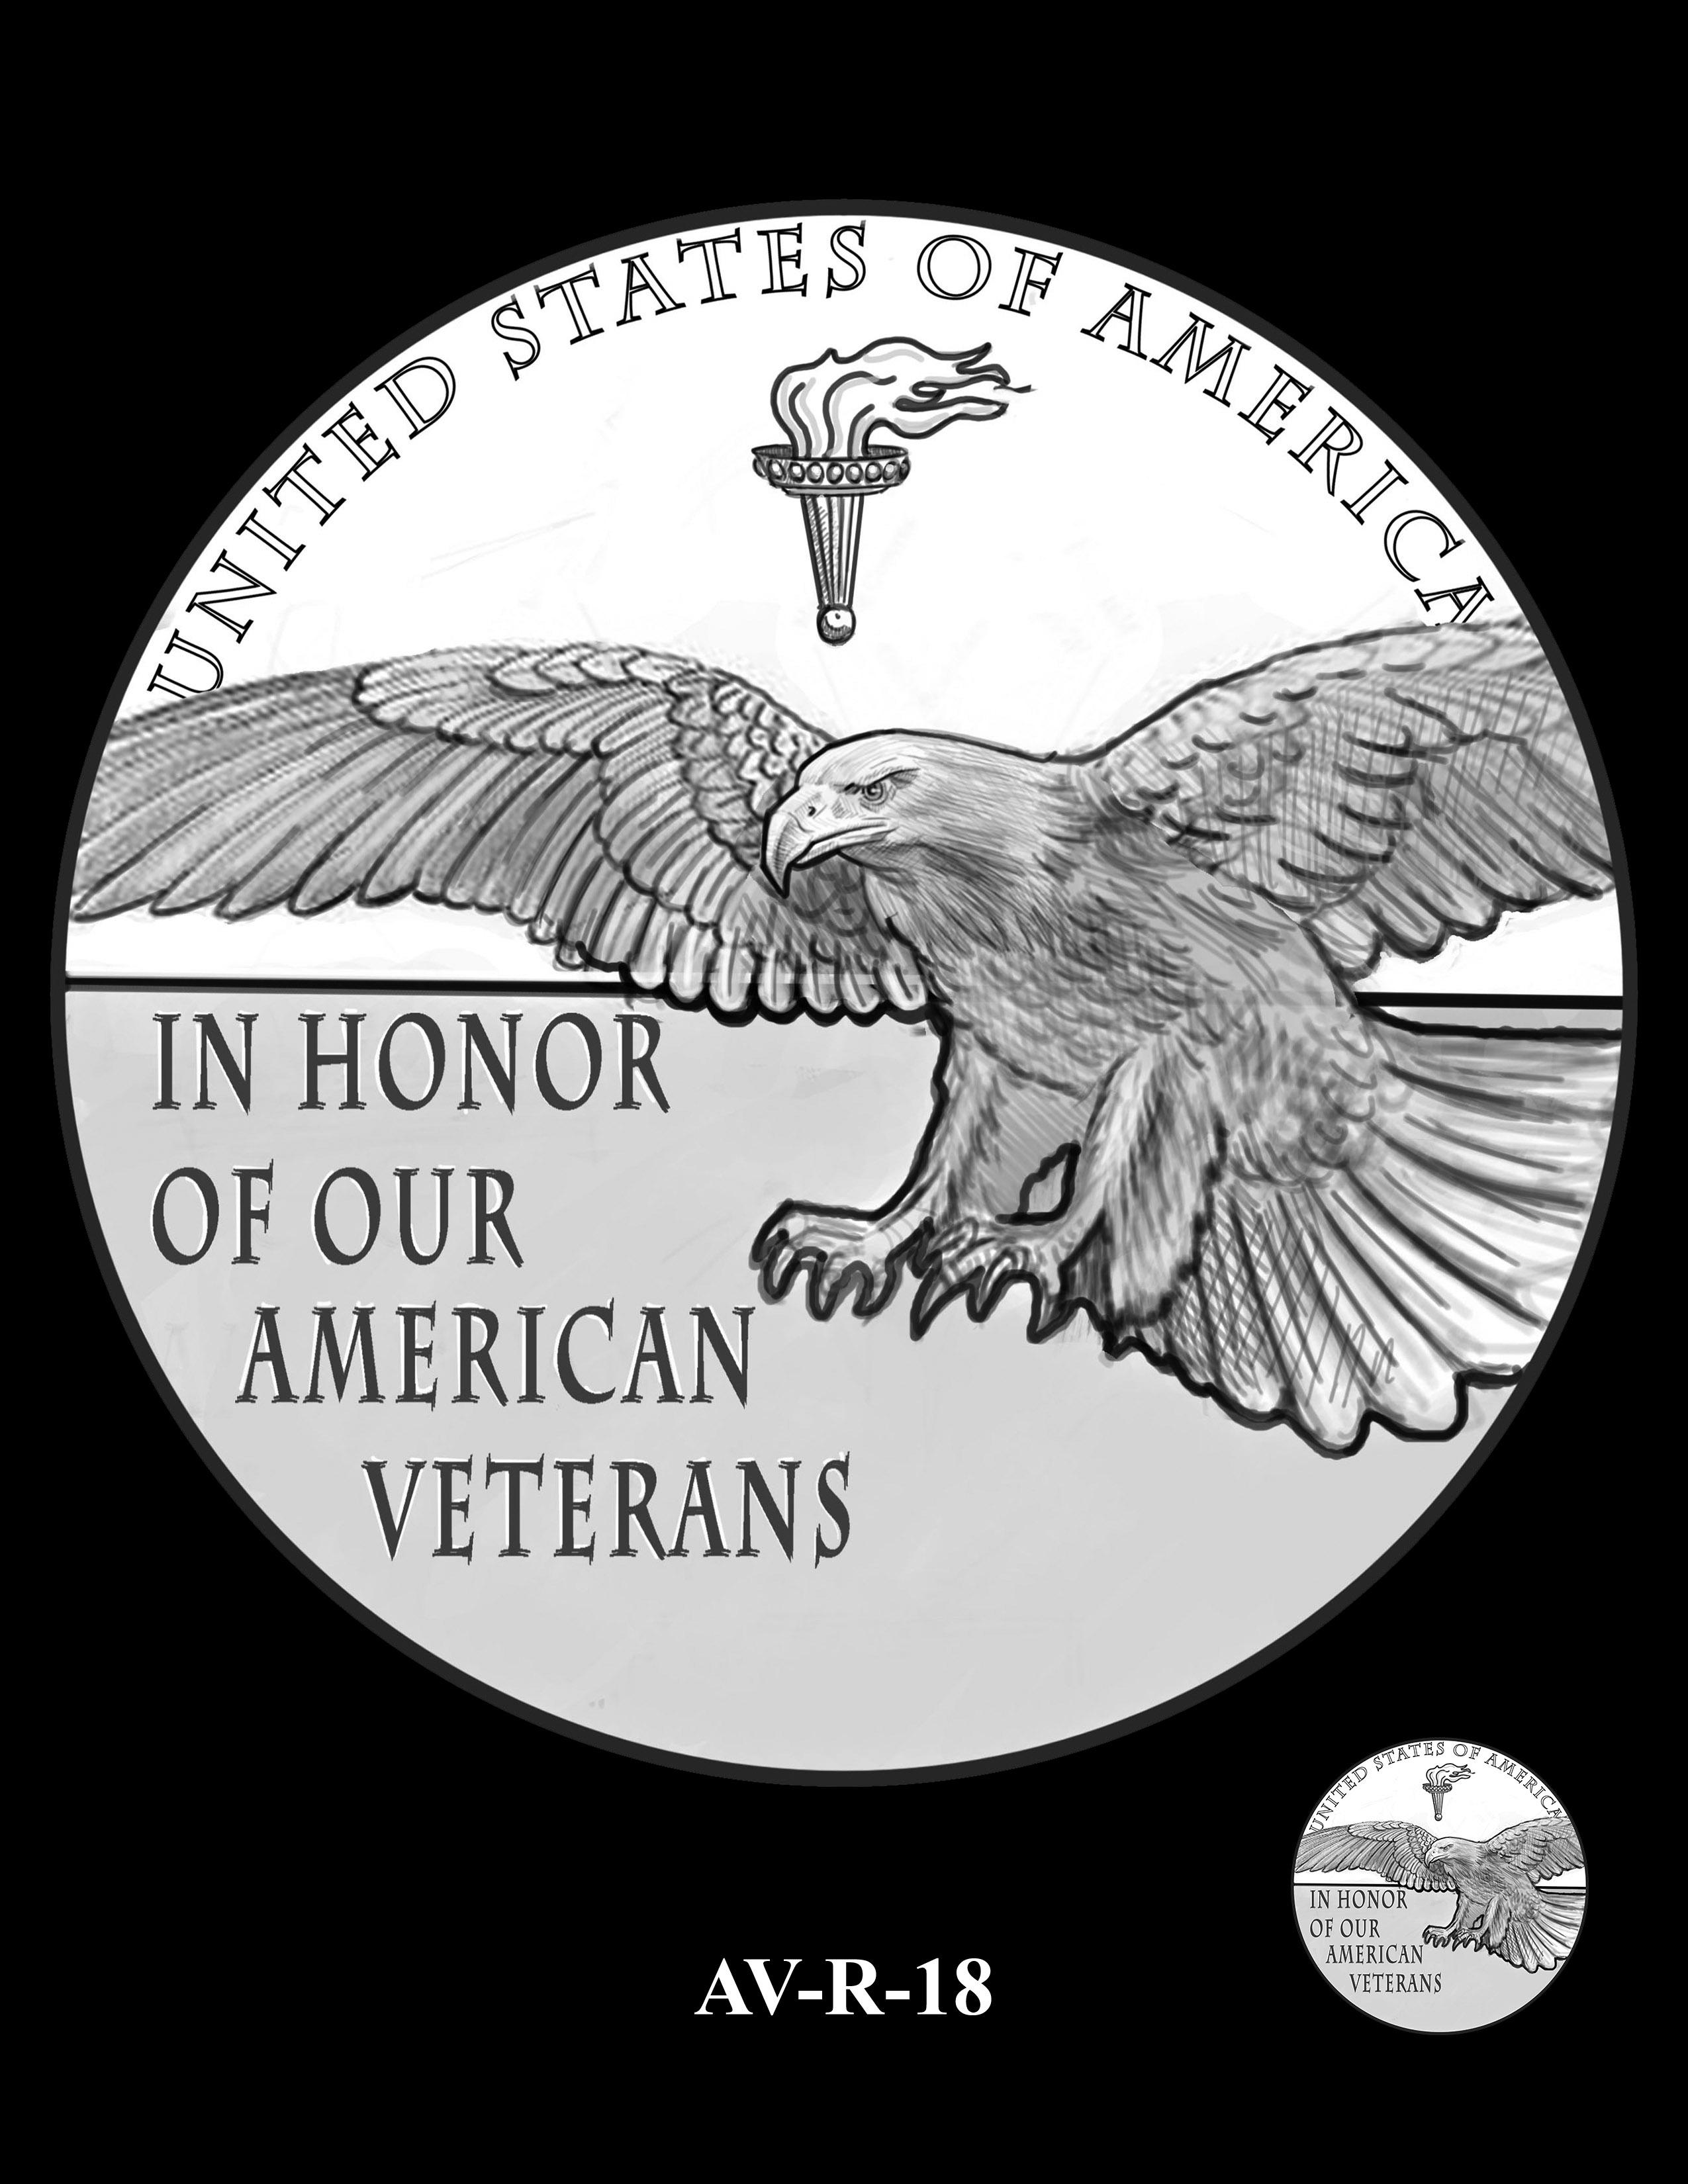 AV-R-18 - American Veterans Medal